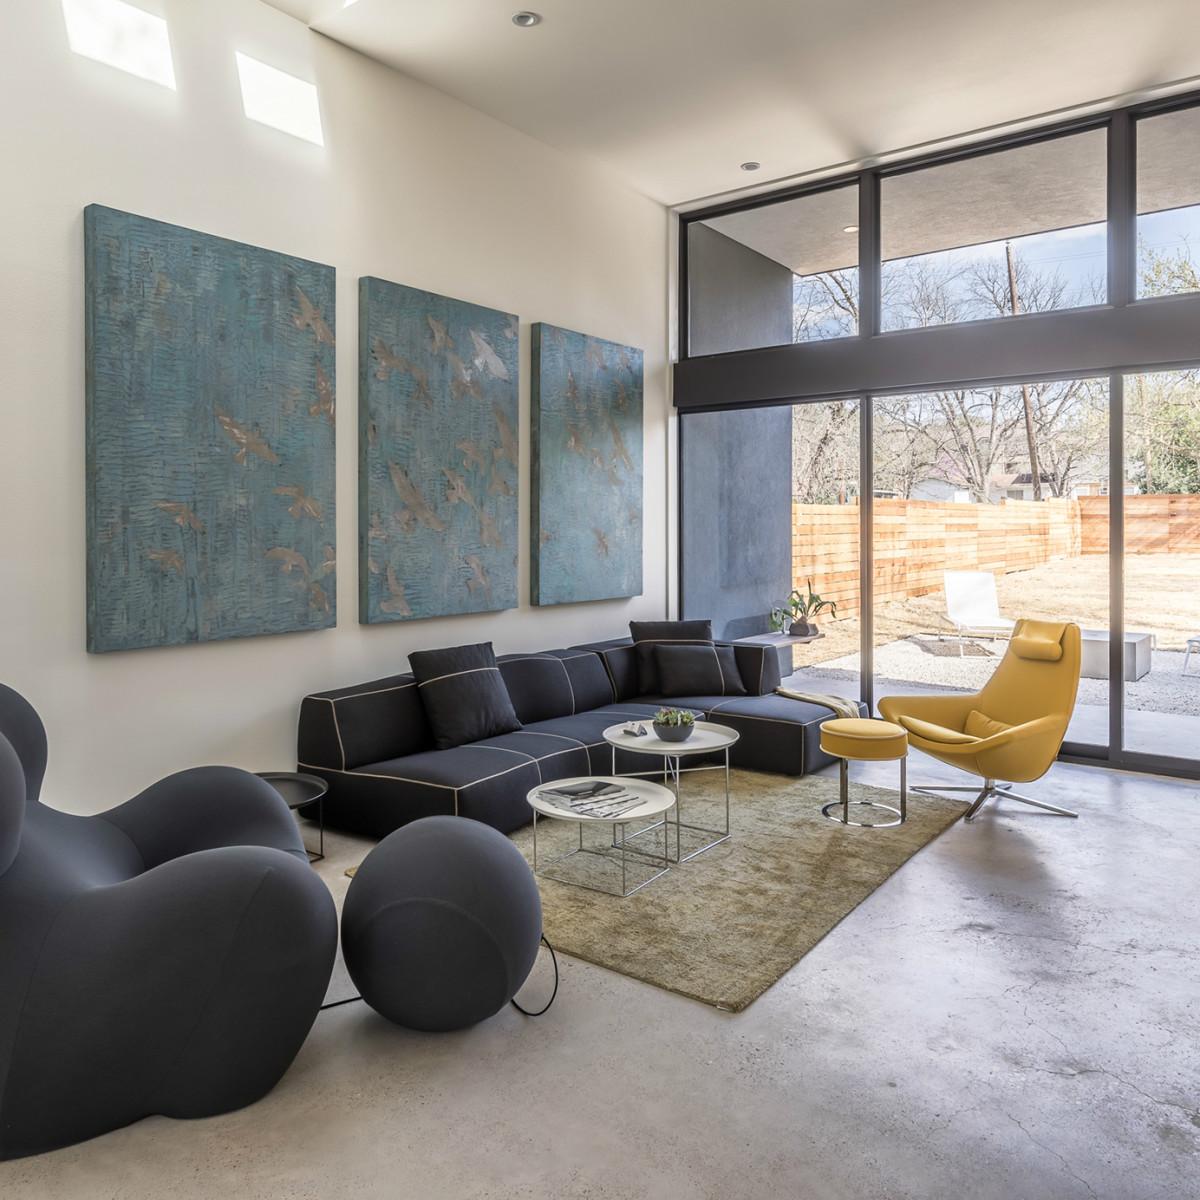 Austin house home dulplex 3305 Garden Villa Lane 78704 March 2016 living